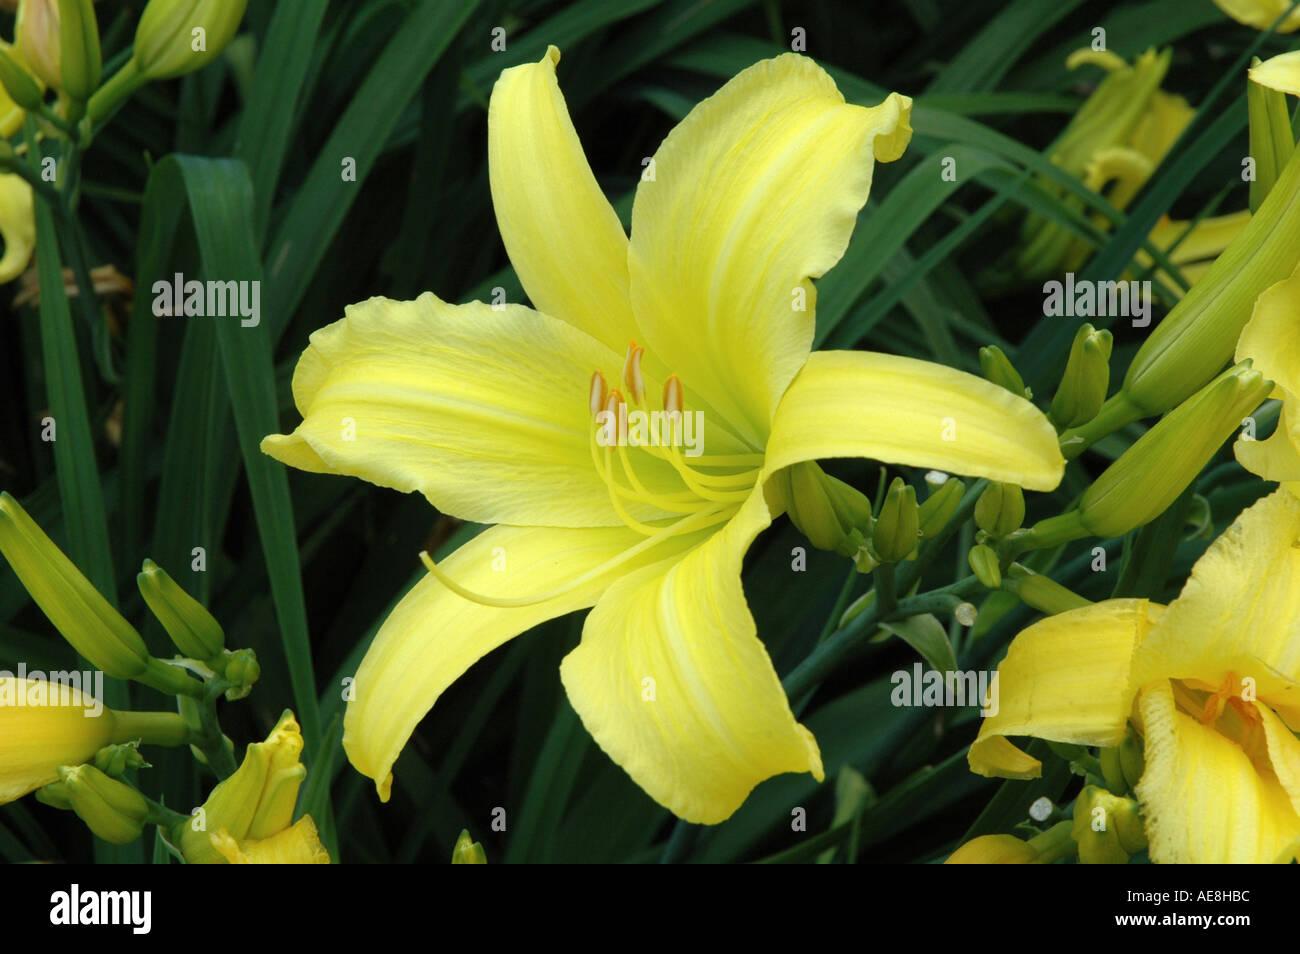 Hemerocallis Marion Vaughn The Day Lily - Stock Image